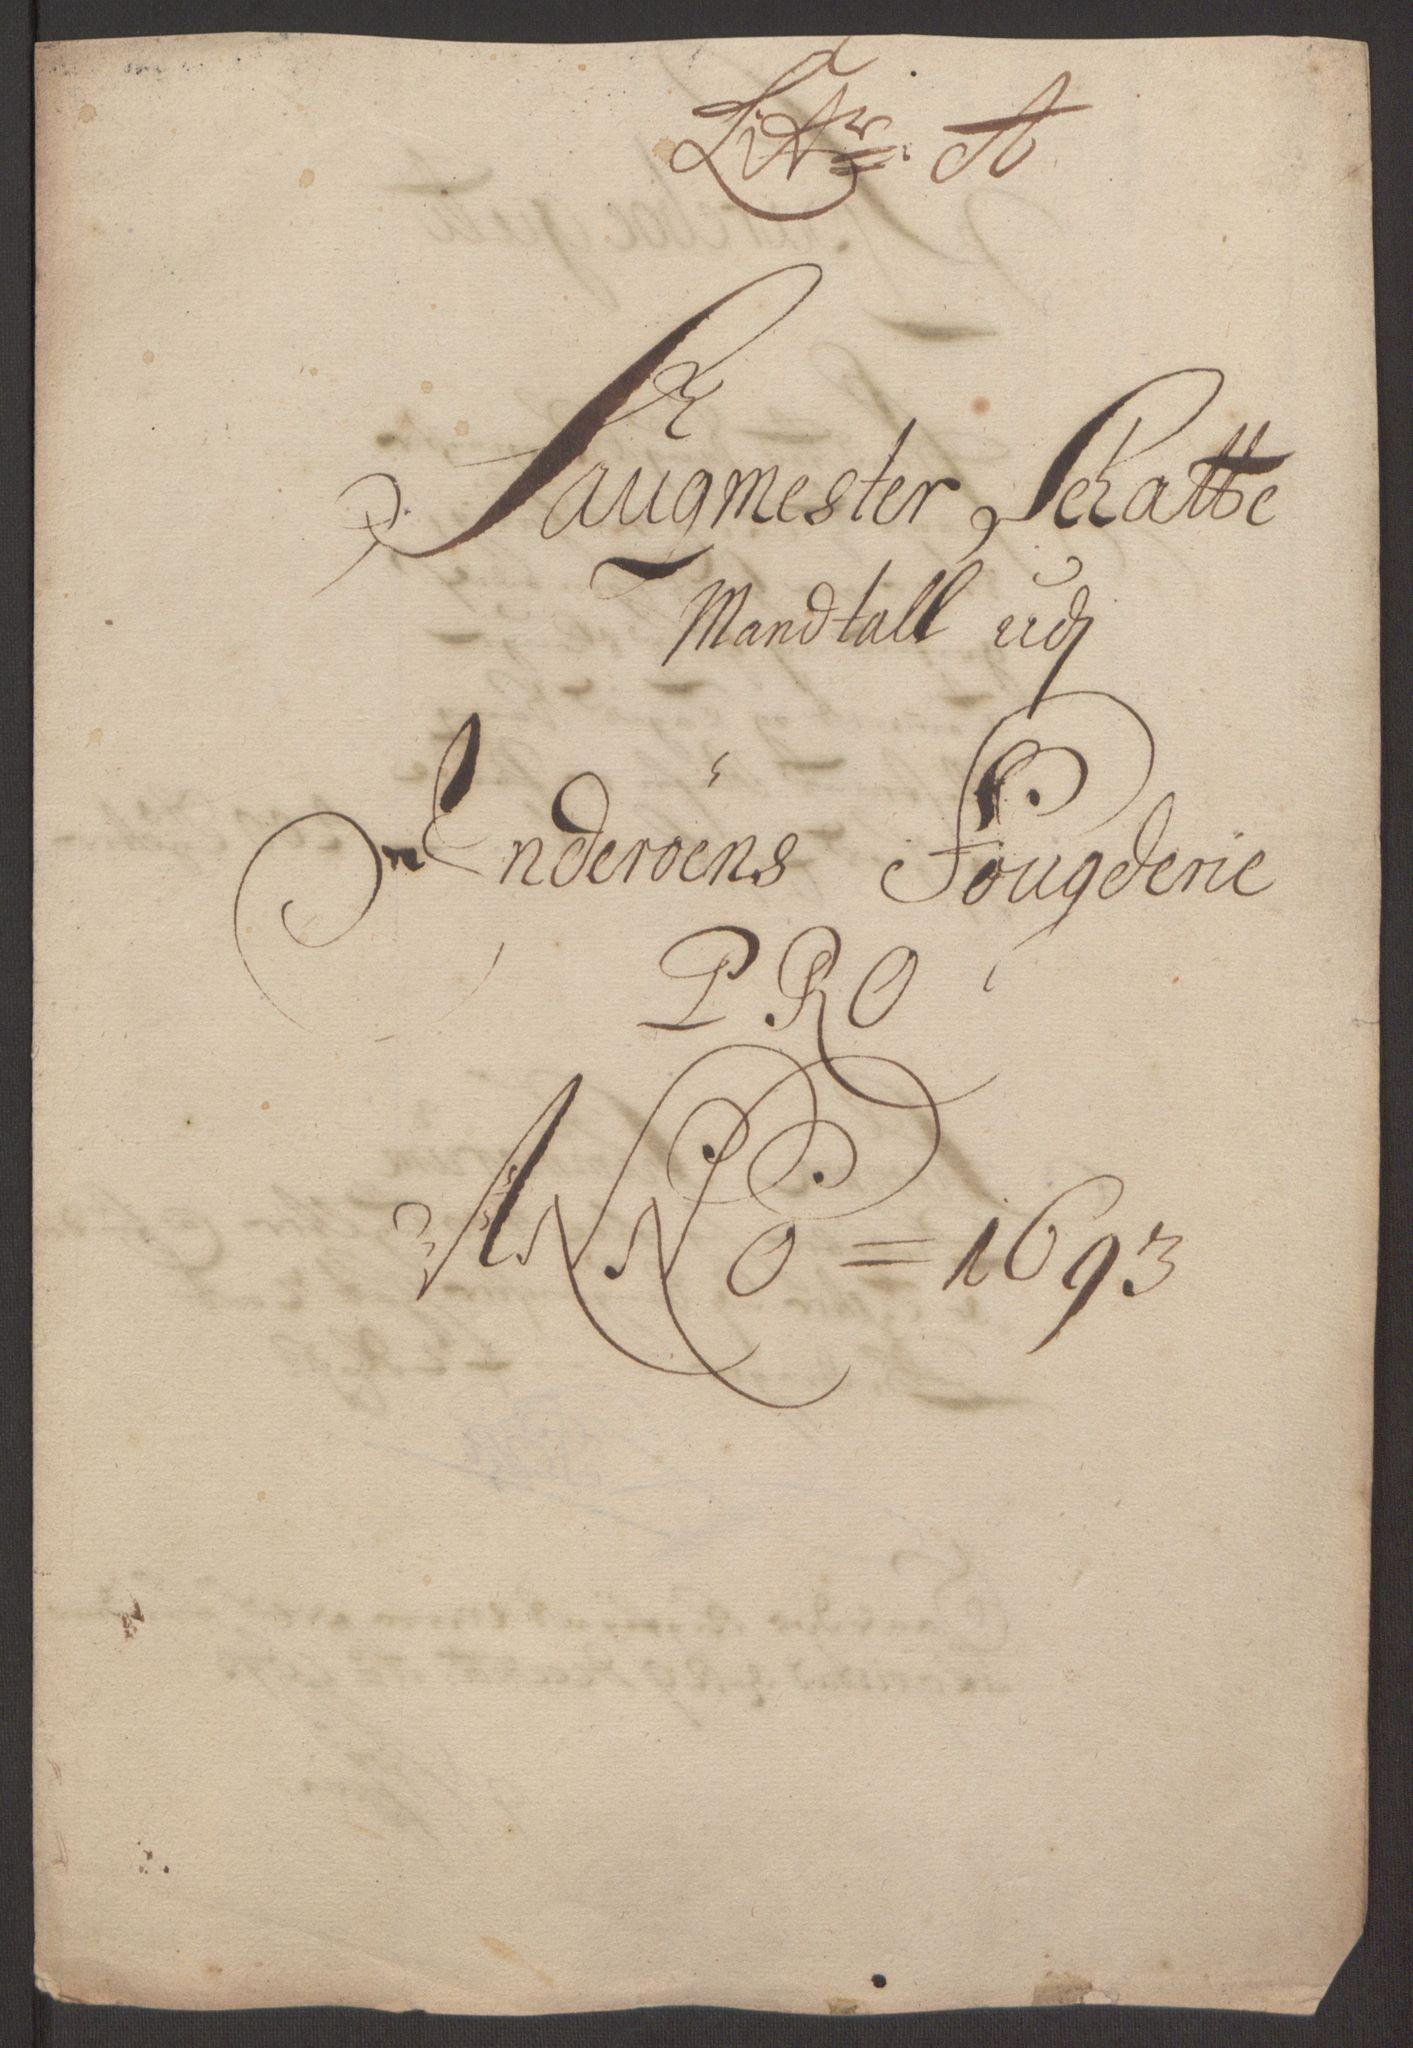 RA, Rentekammeret inntil 1814, Reviderte regnskaper, Fogderegnskap, R63/L4308: Fogderegnskap Inderøy, 1692-1694, s. 423